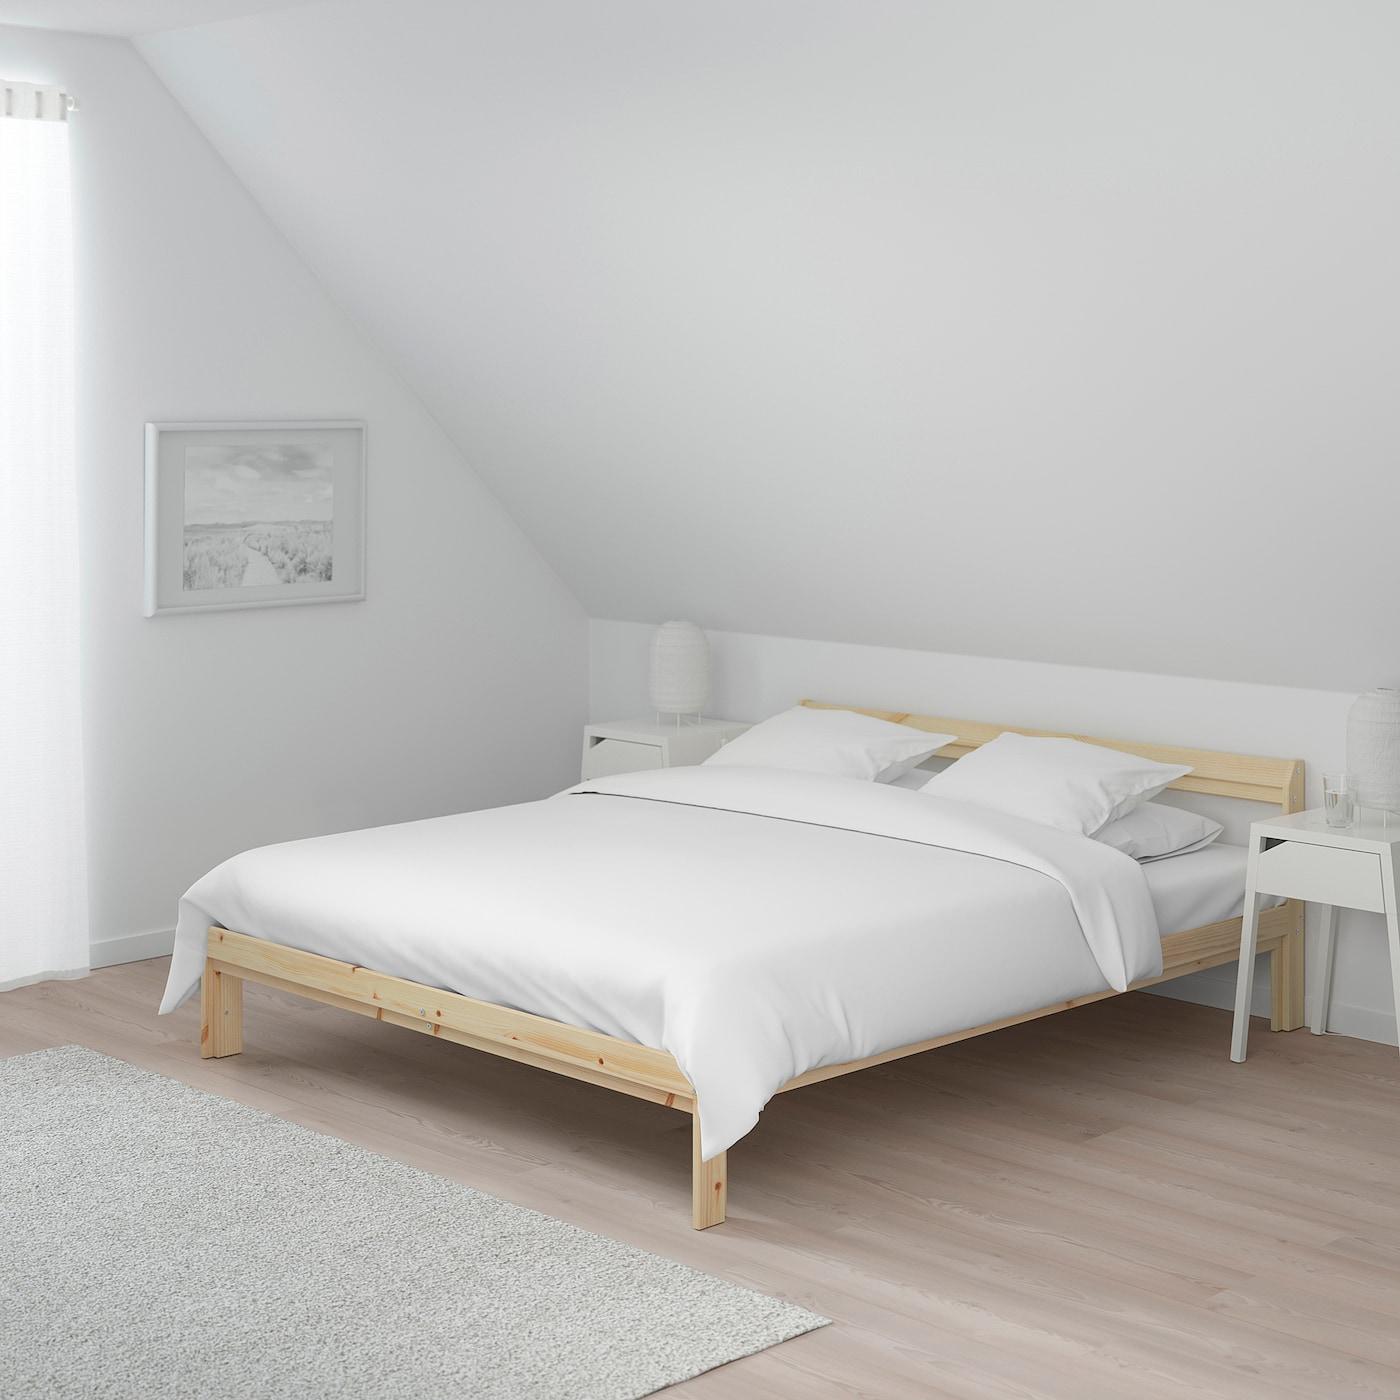 Neiden Bettgestell Kiefer Ikea Deutschland